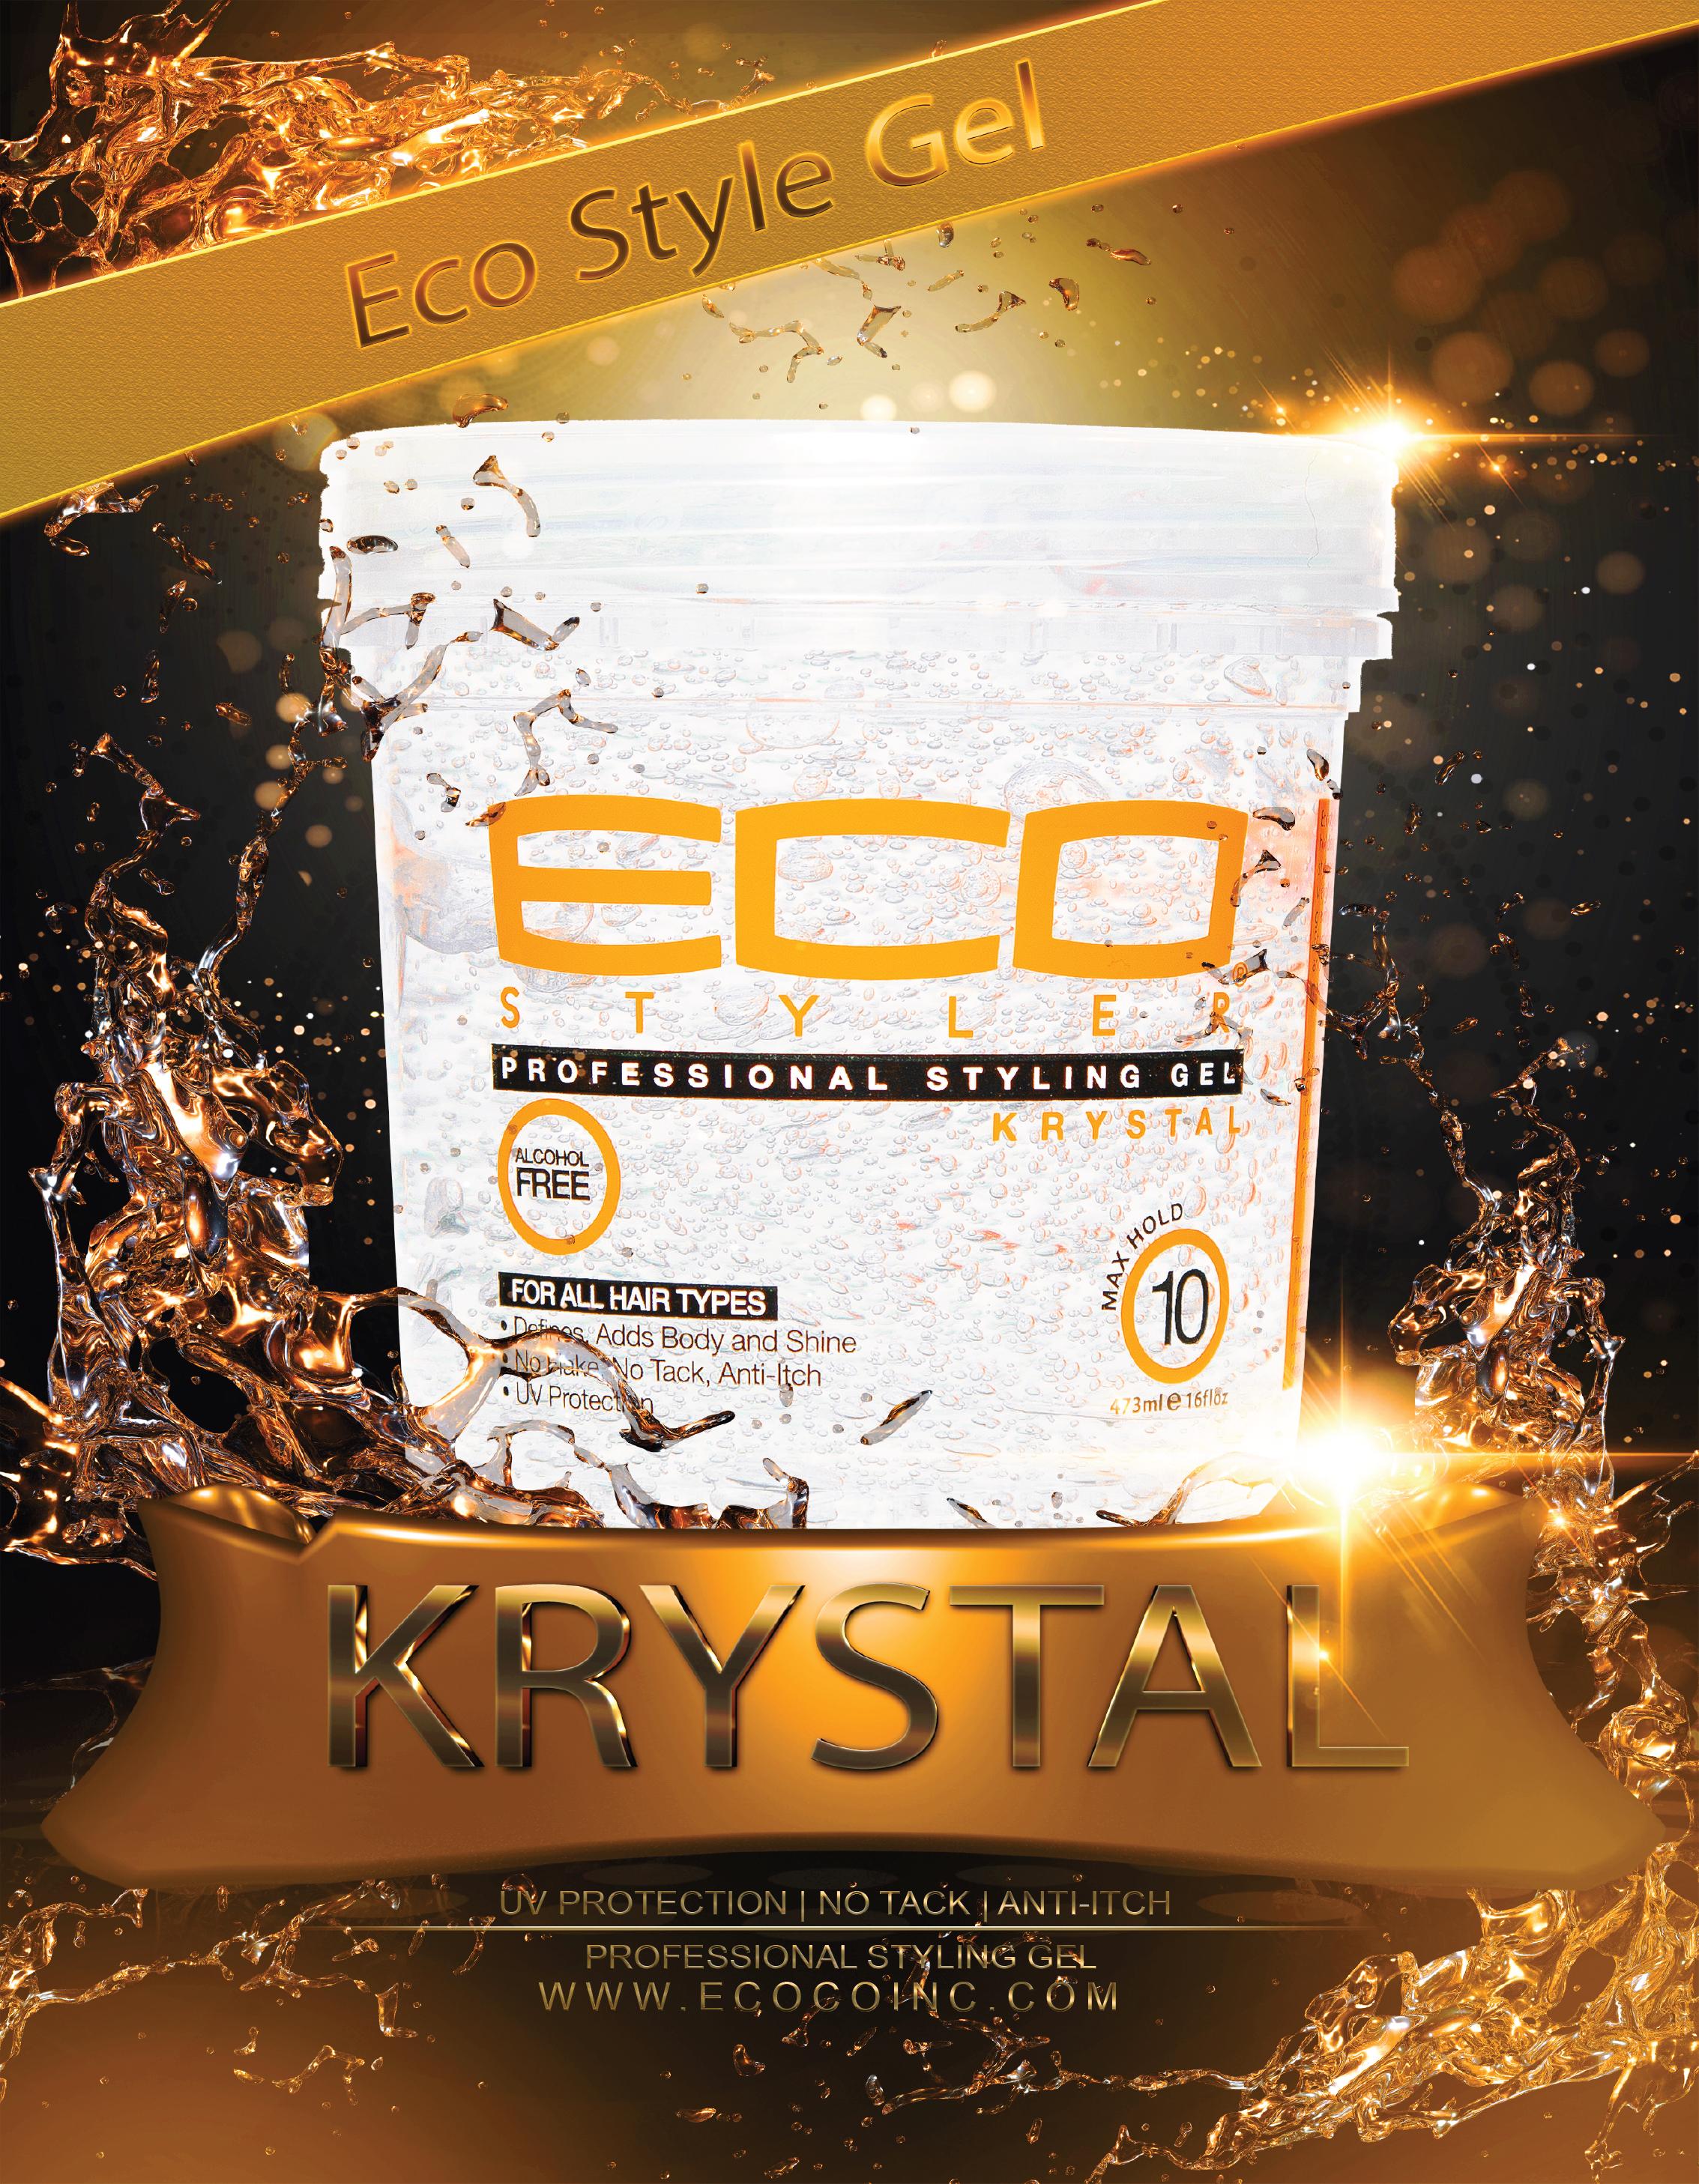 Eco Style Coconut Oil Marketing A.jpg